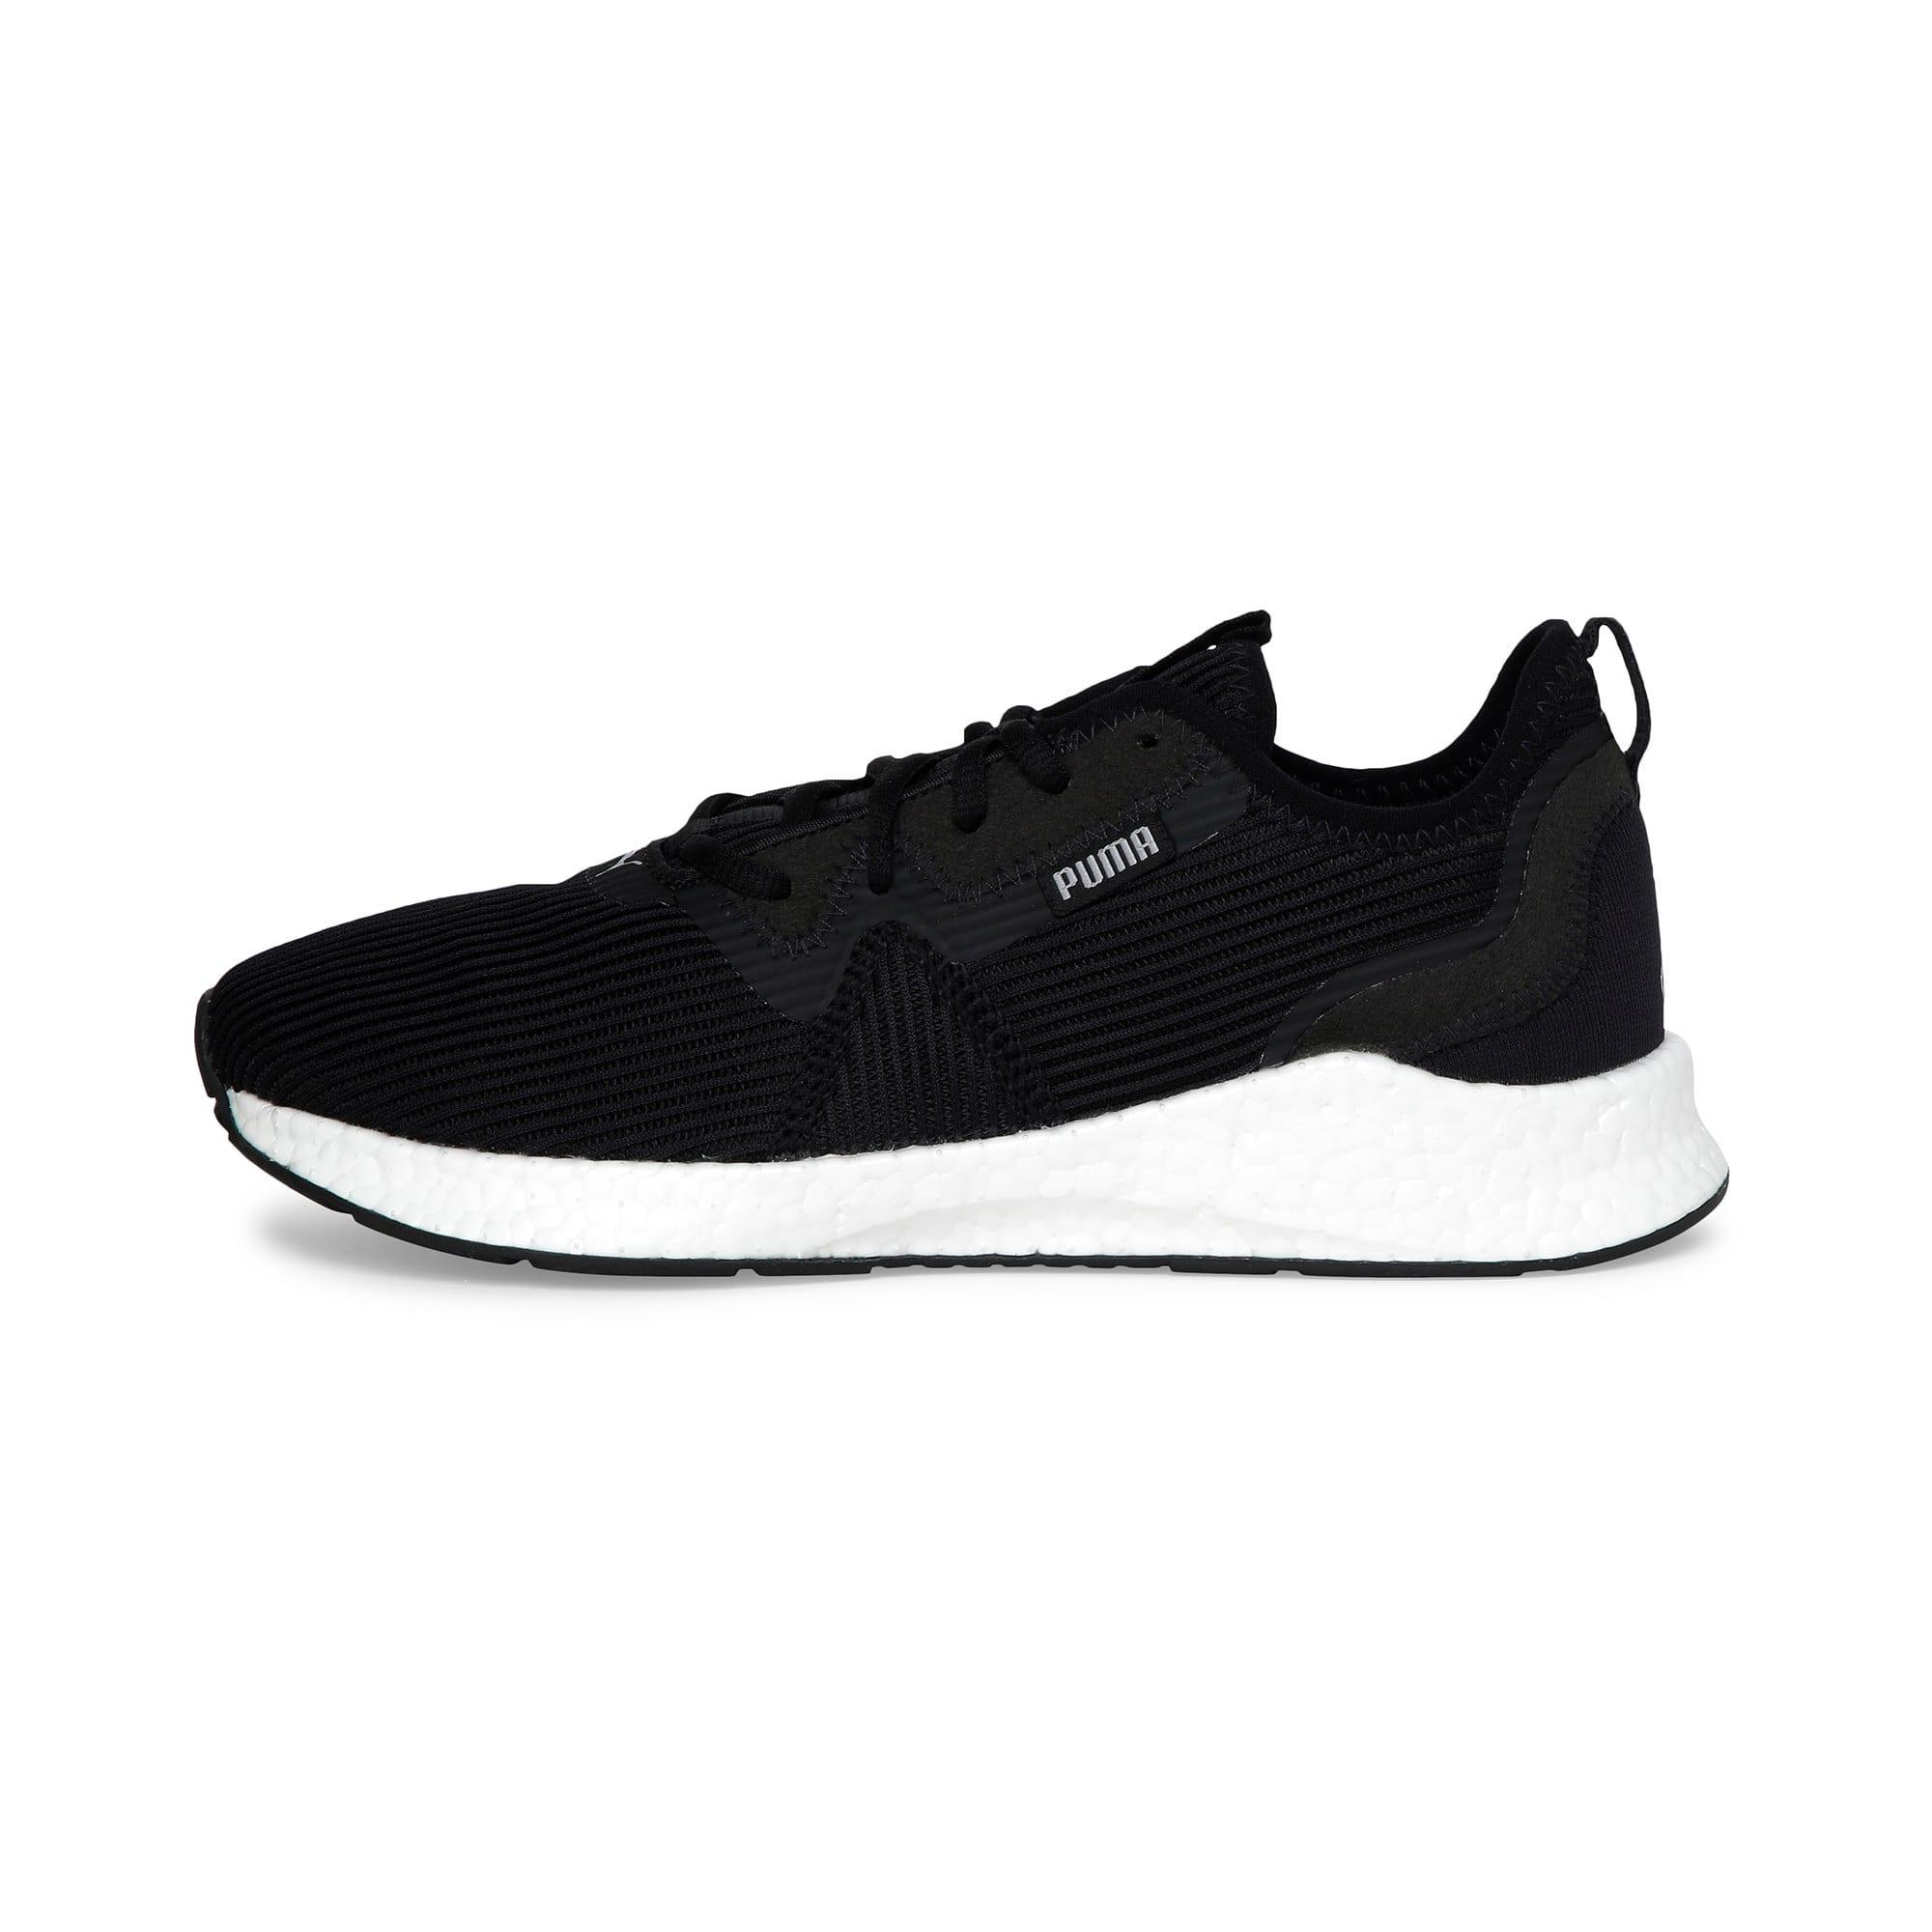 Thumbnail 1 of NRGY Star Femme Women's Running Shoes, Black-Silver-White, medium-IND